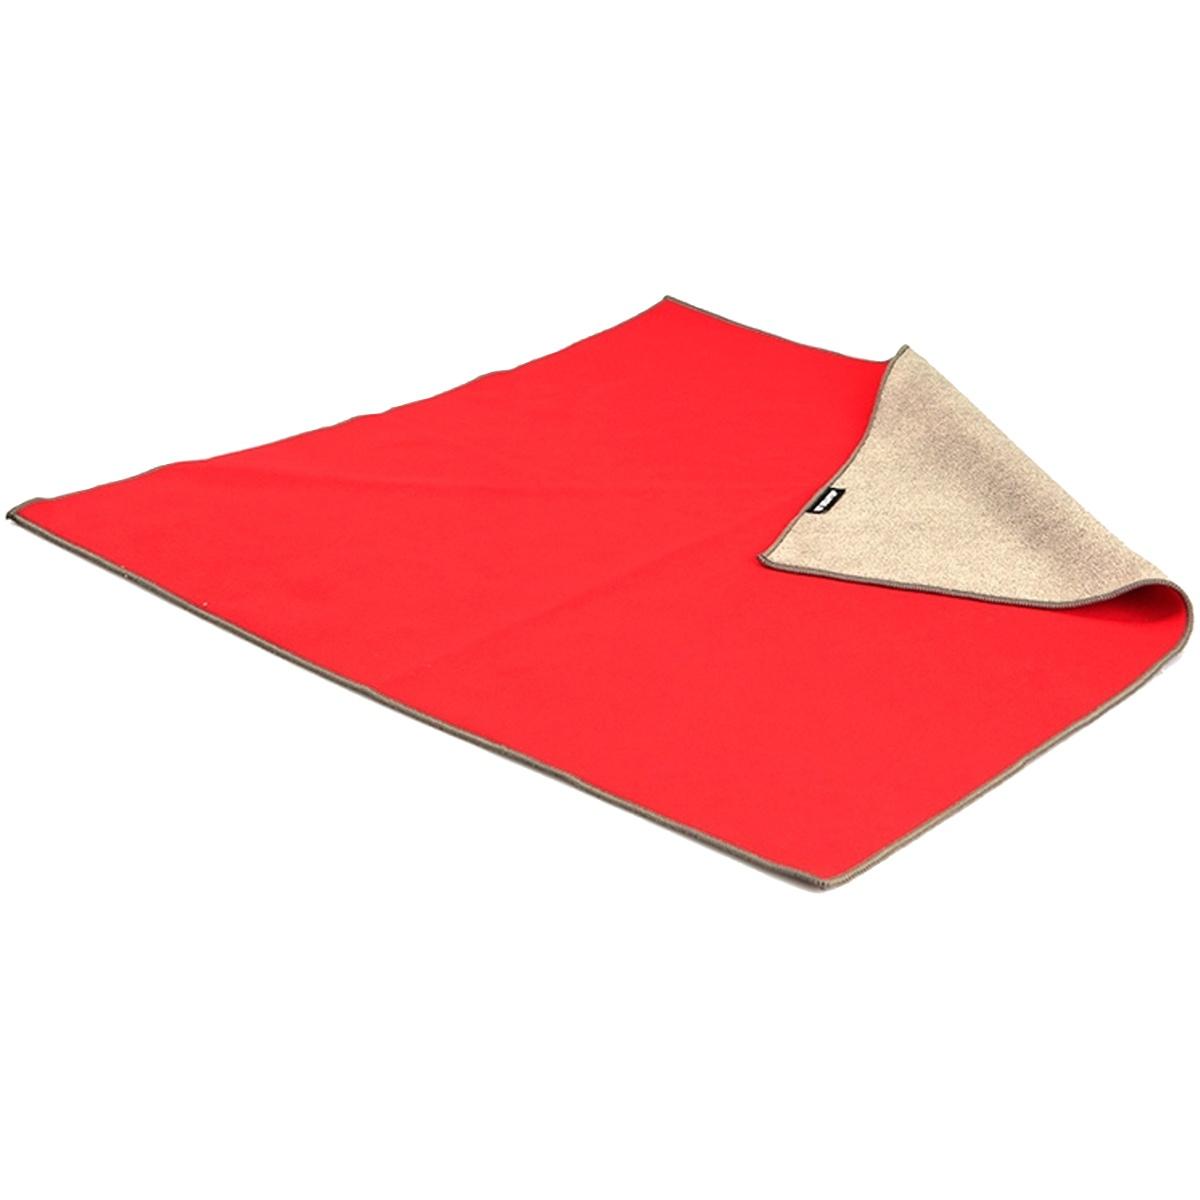 Einschlagtuch Easy Wrapper (S) Rot